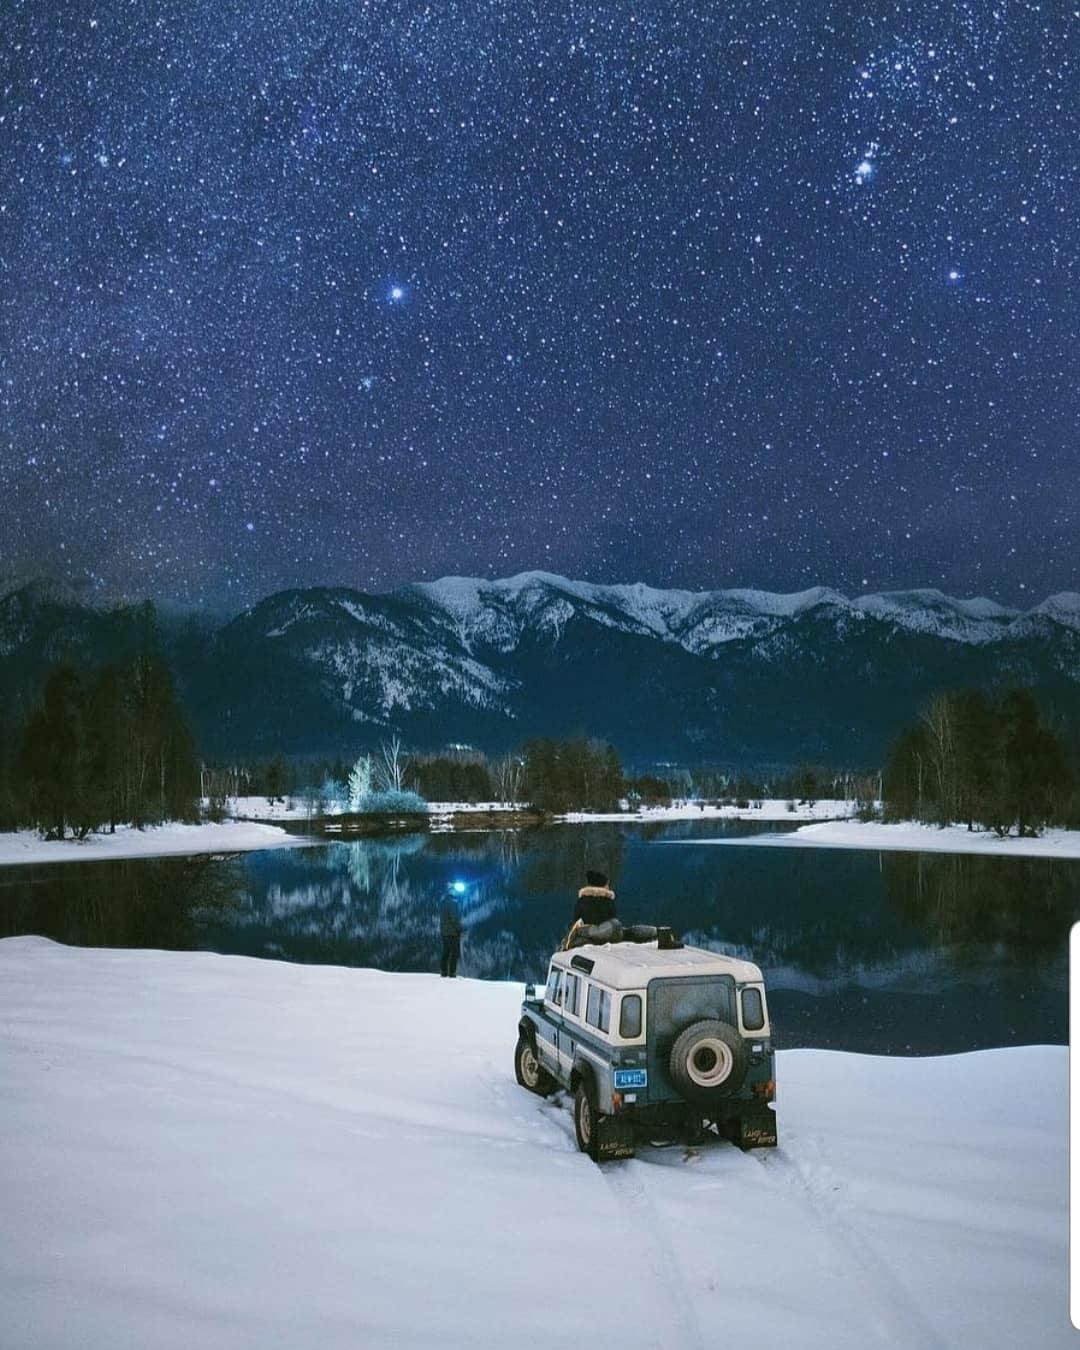 cold starlit night